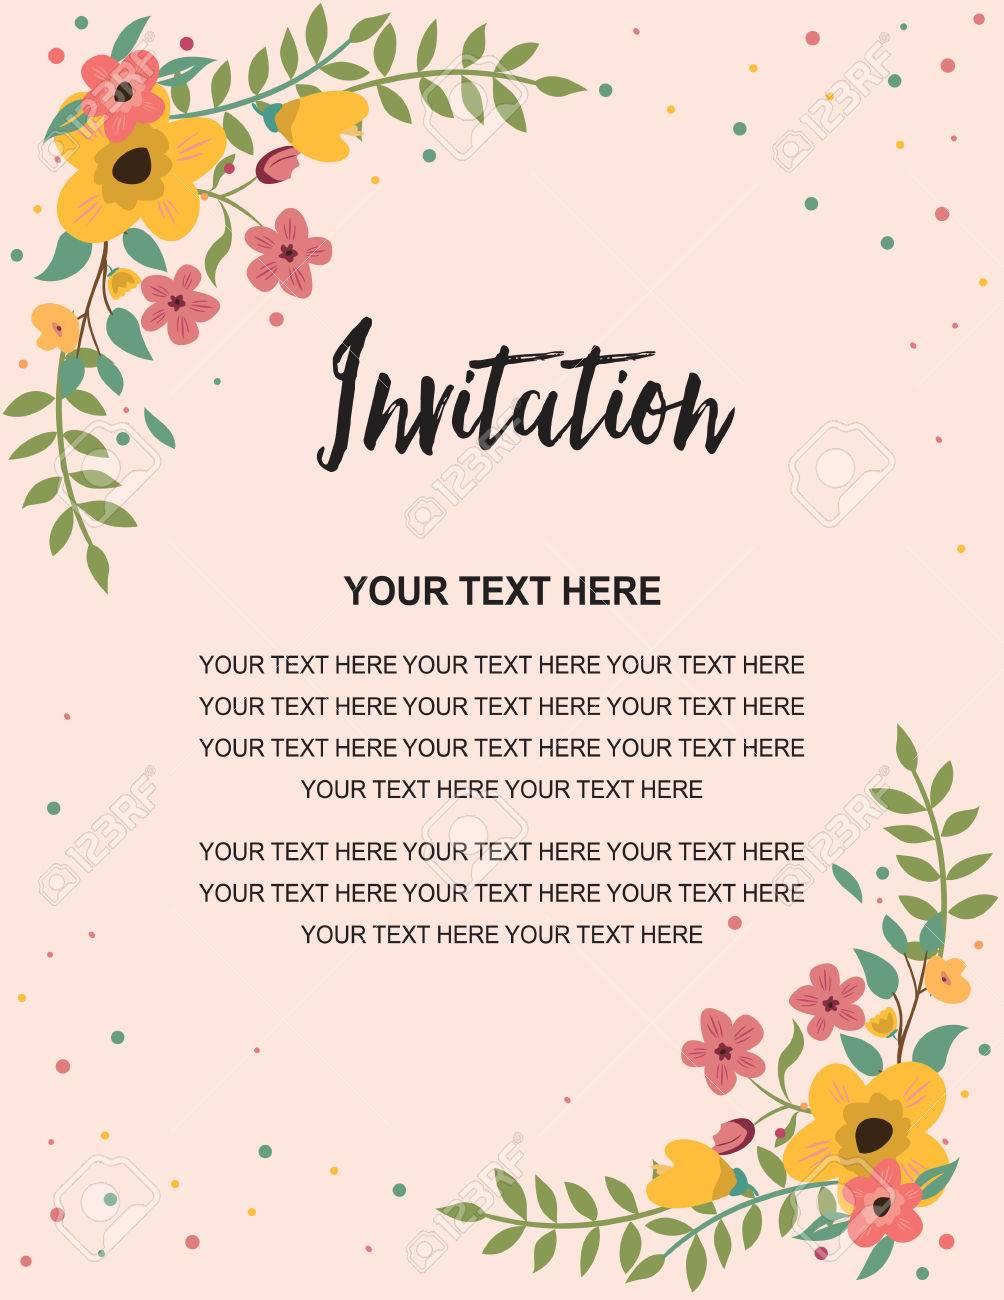 Wedding Invitation Greeting Card Template Vintage Floral Design